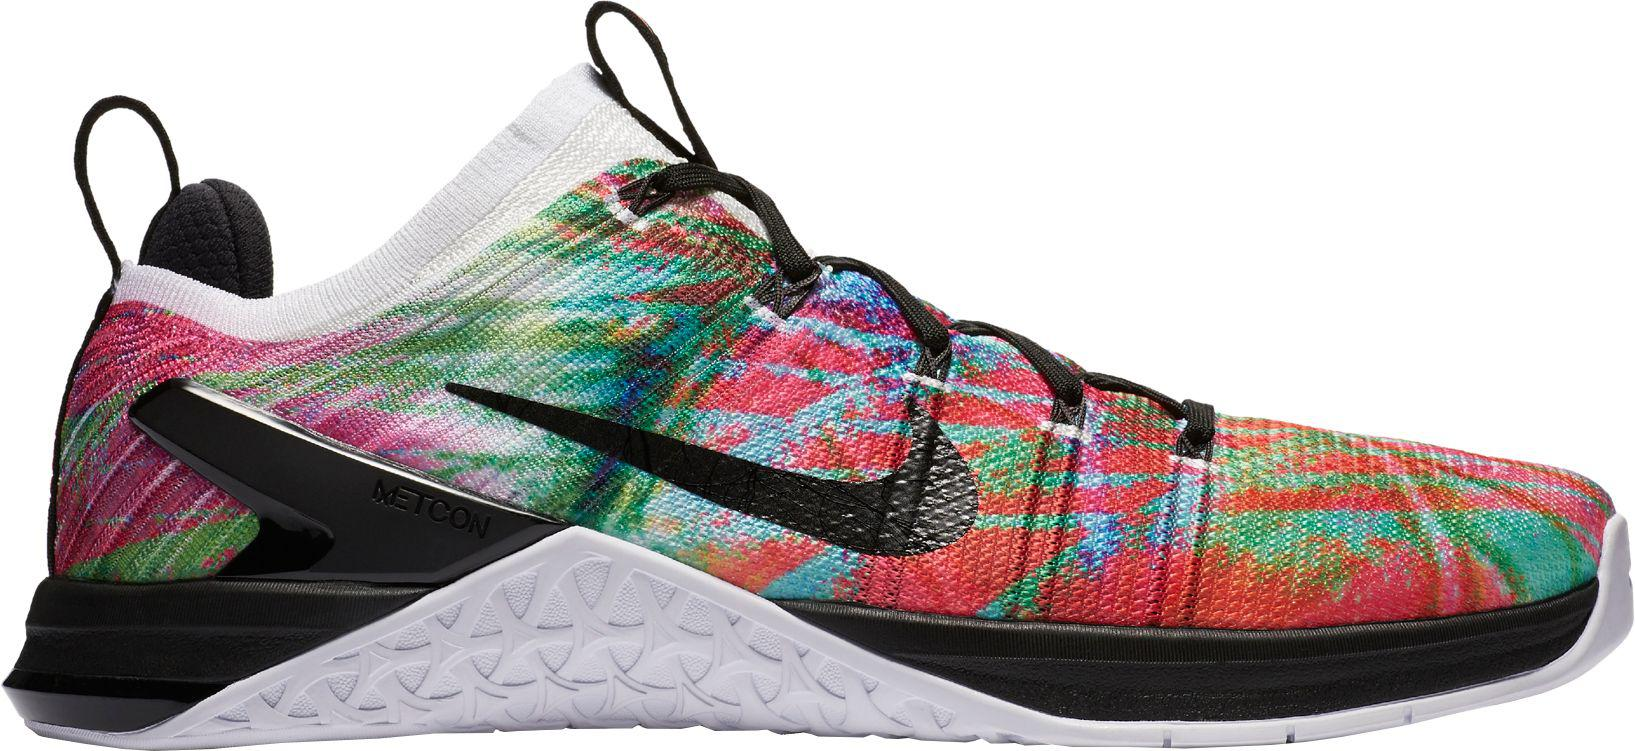 cdd84b8938b08e Nike - Multicolor Metcon Dsx Flyknit 2 Wodapalooza Training Shoes for Men -  Lyst